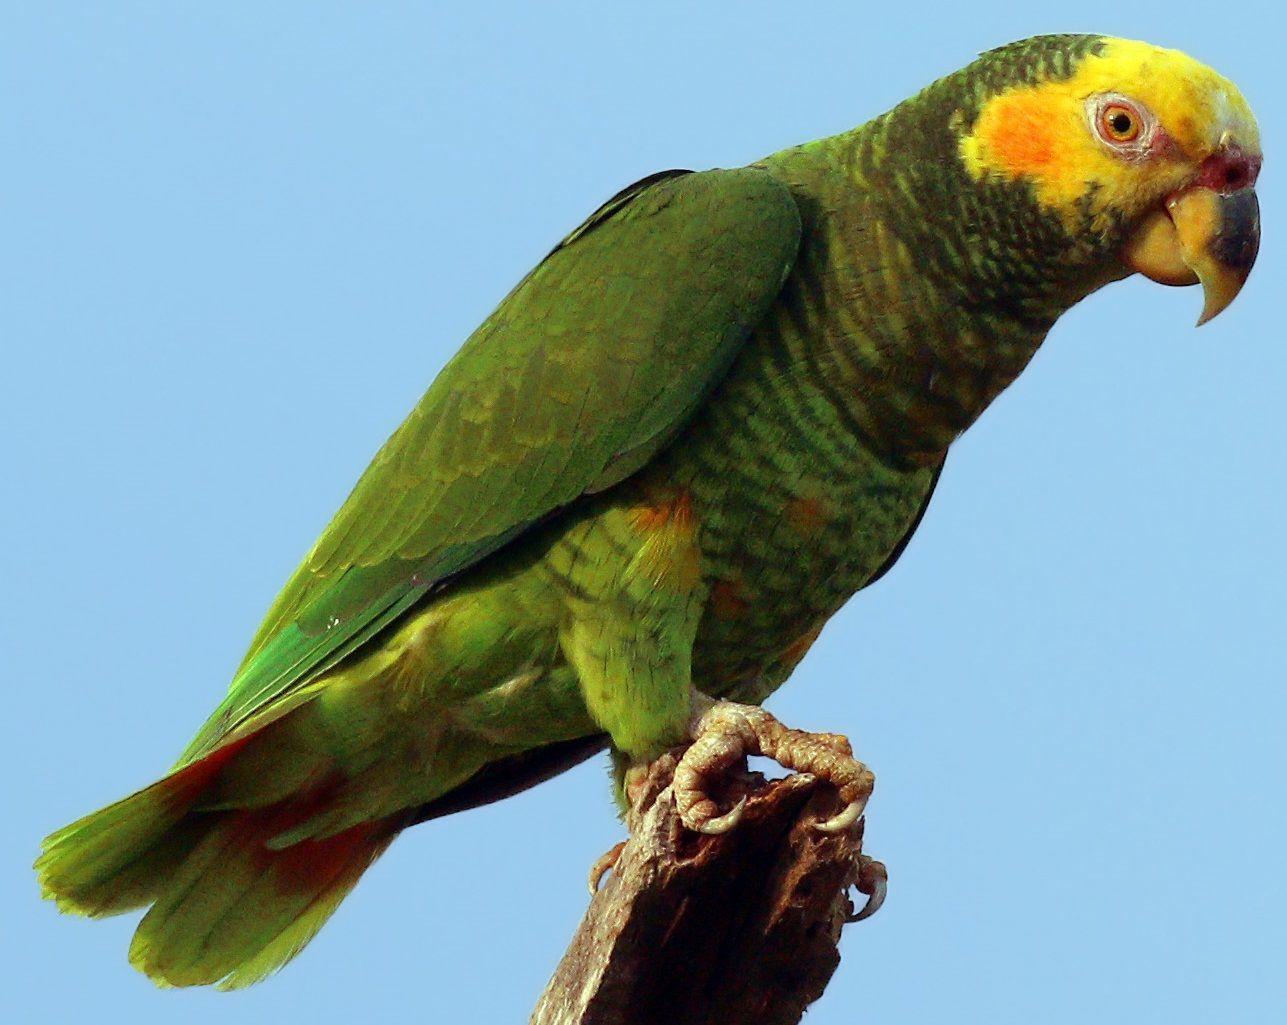 طوطی امازون صورت زرد Yellow-faced Parrot